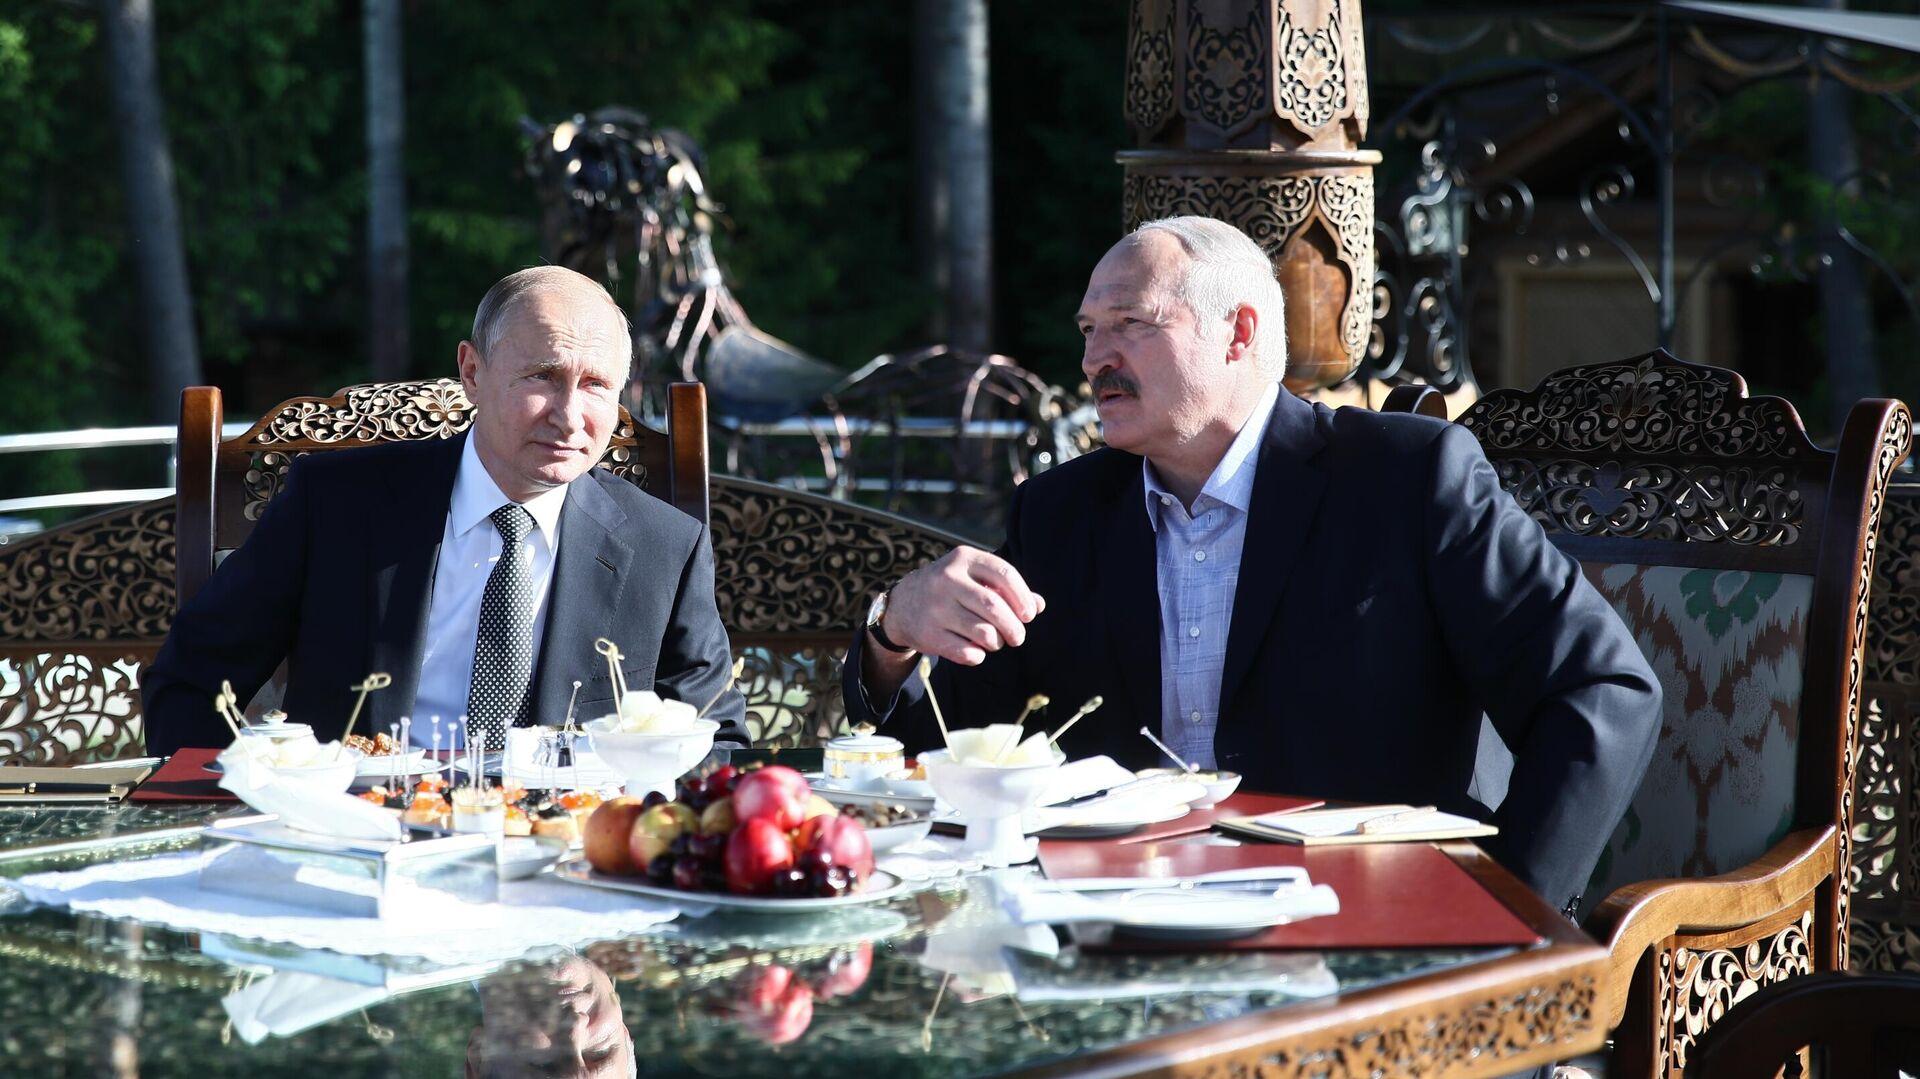 Президент РФ Владимир Путин и президент Белоруссии Александр Лукашенко во время встречи в Минске. 30 июня 2019 - РИА Новости, 1920, 08.08.2020